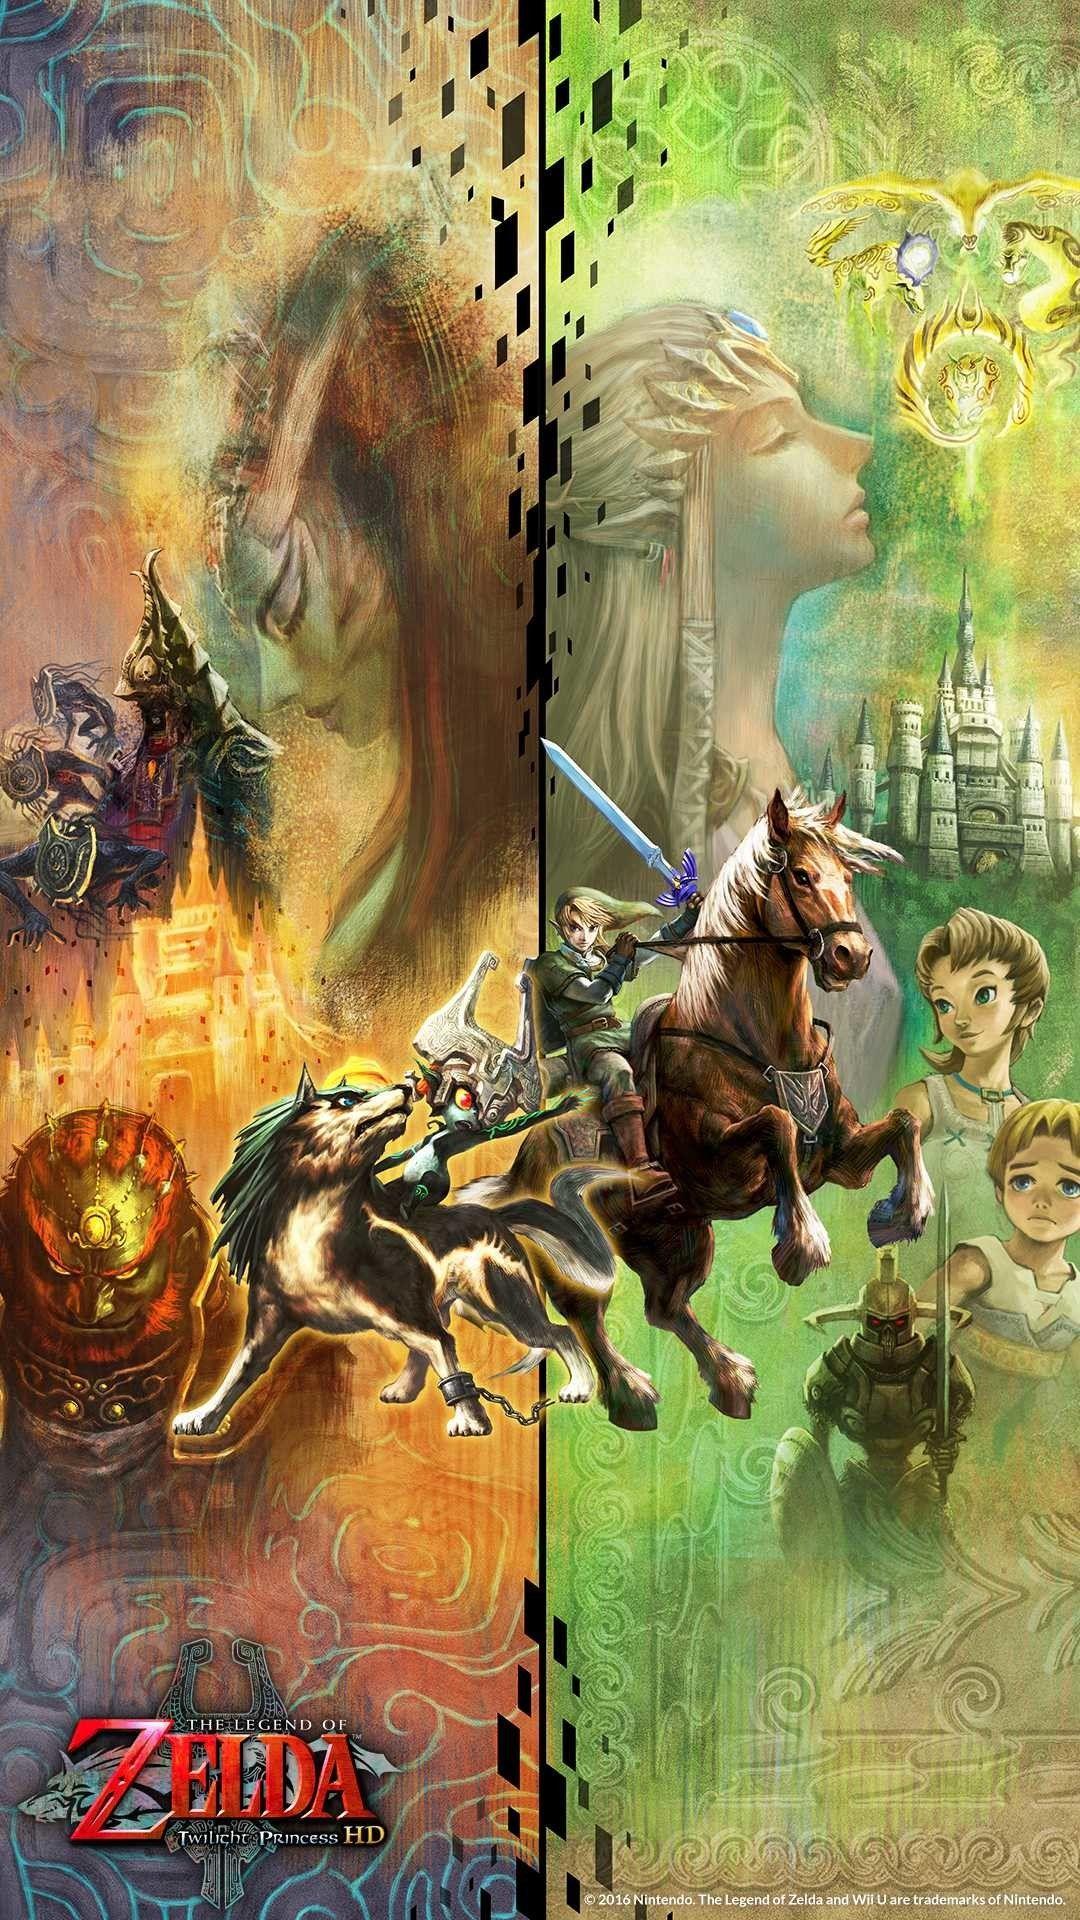 Twilight Princess Wallpapers Top Free Twilight Princess